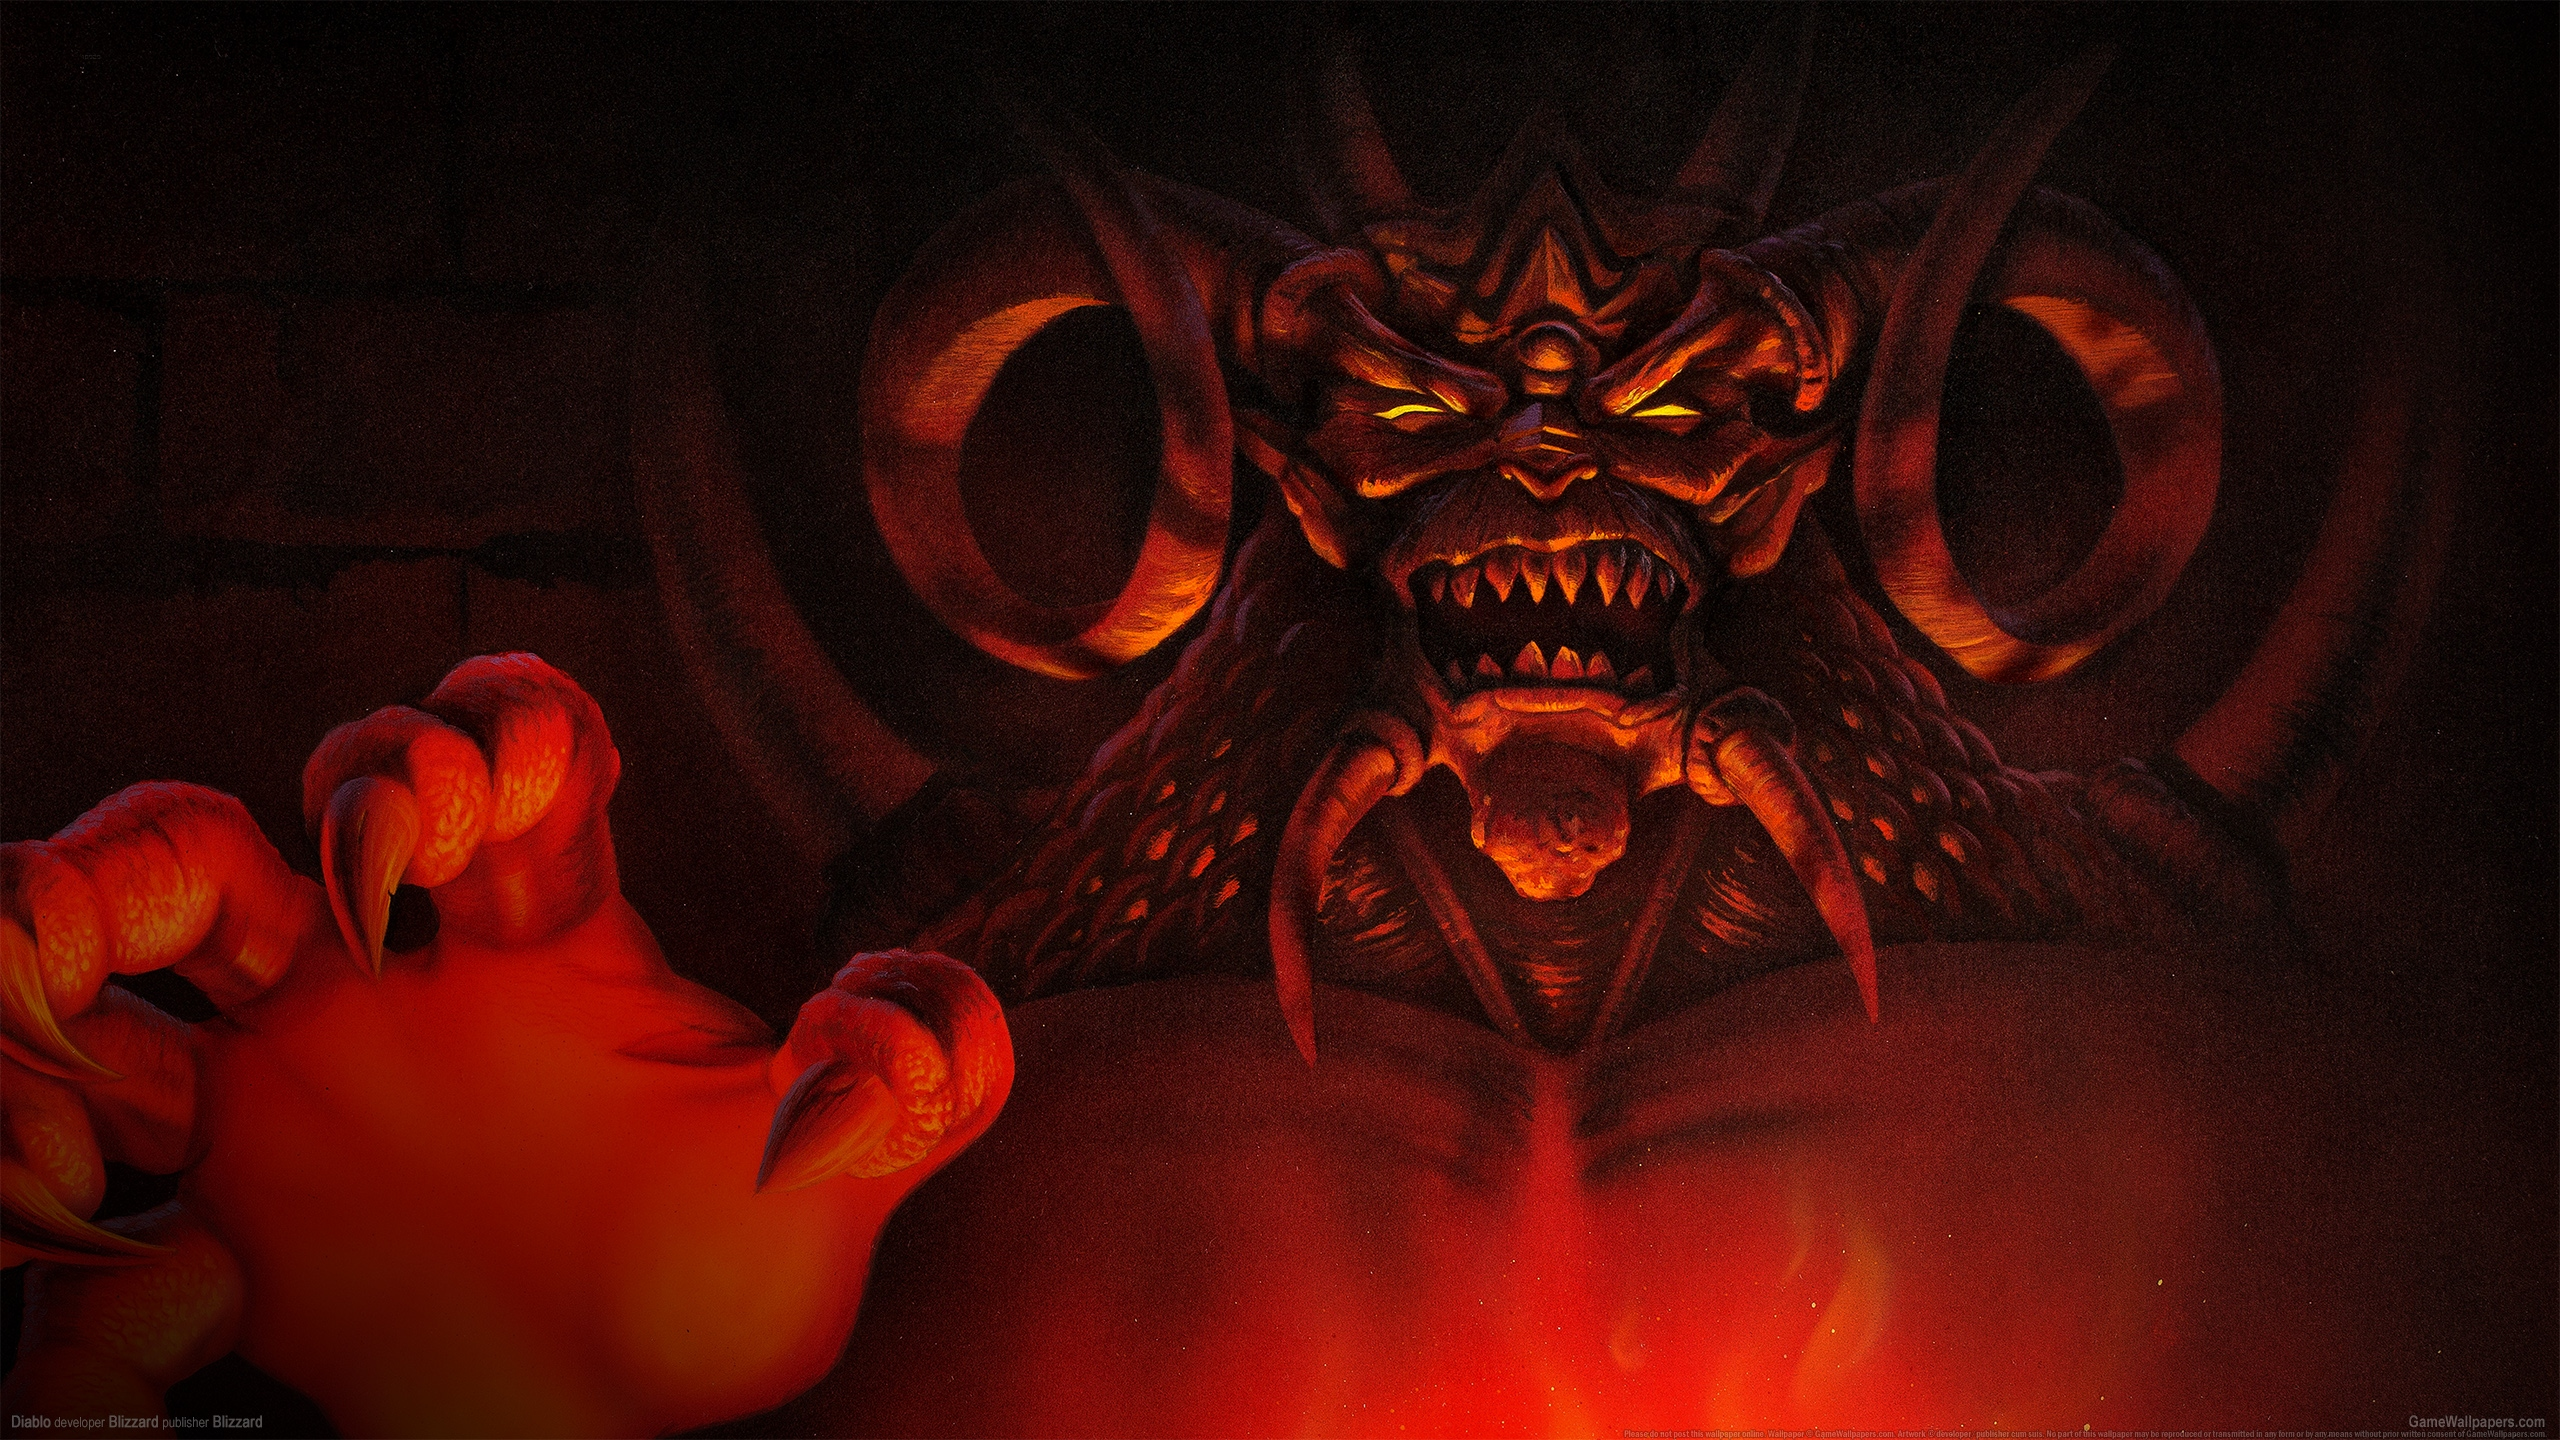 Diablo 2560x1440 wallpaper or background 01